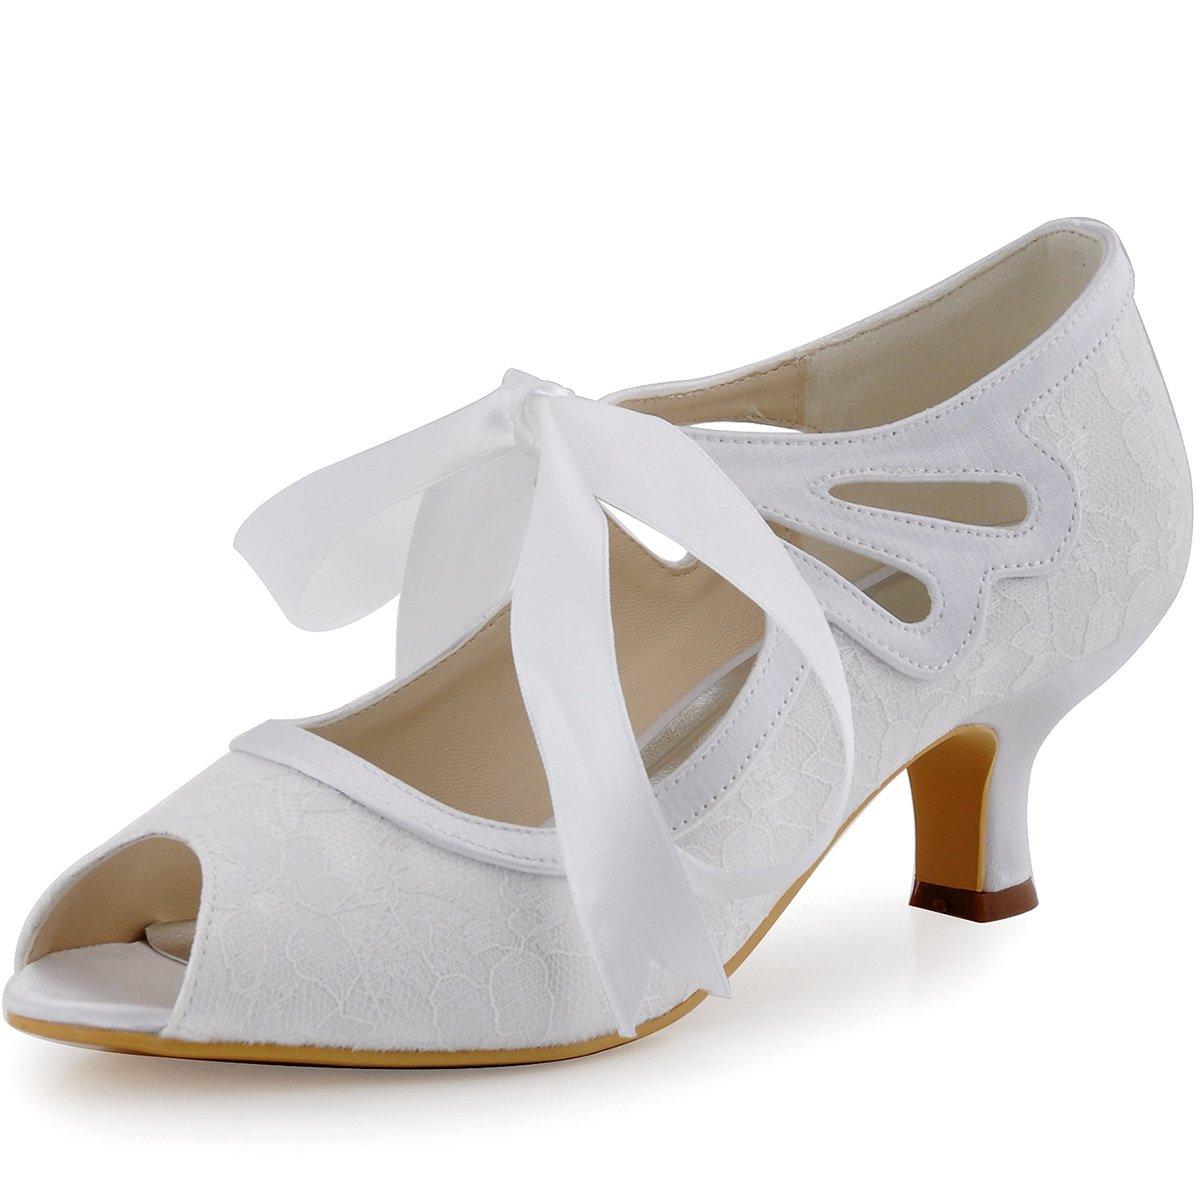 Elegantpark HP1522 Women s Mary Jane Peep Toe Mid Heel Ribbon Tie Cut-Out  Lace Satin Wedding Bridal Pumps Shoes White US 9  Amazon.ca  Shoes    Handbags 073f88d87855